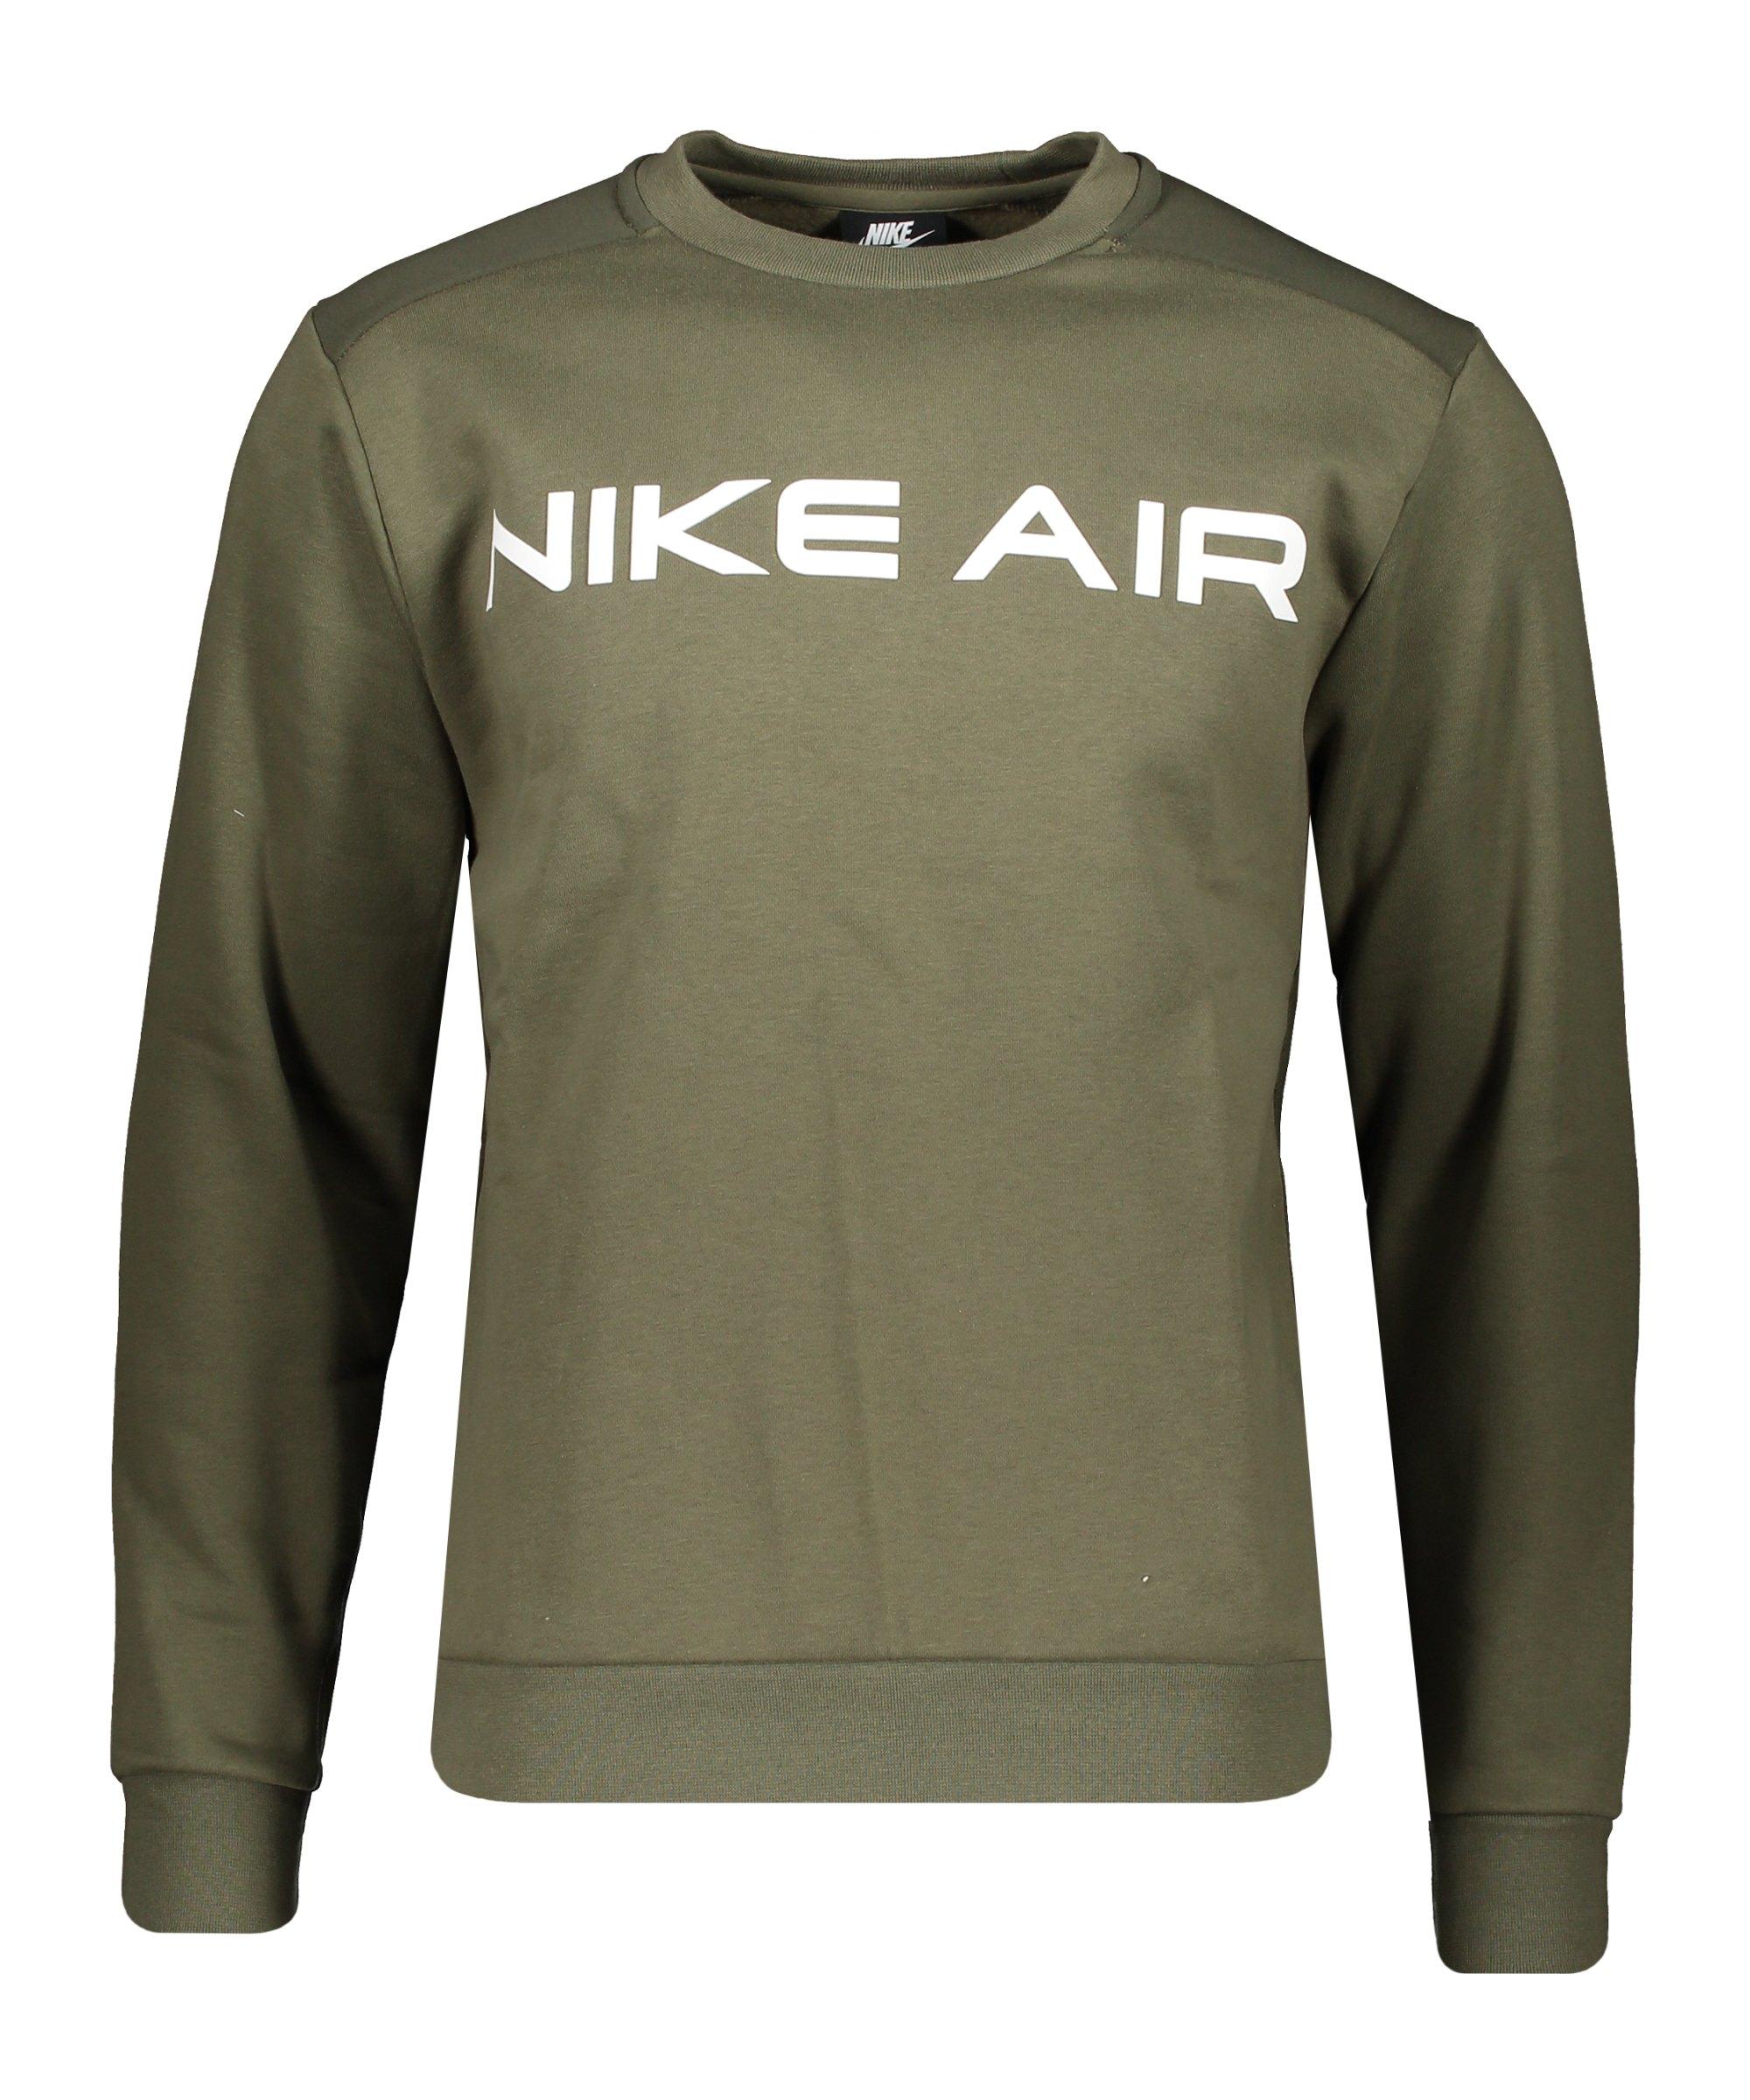 Nike Air Fleece Sweatshirt Grün F222 - gruen